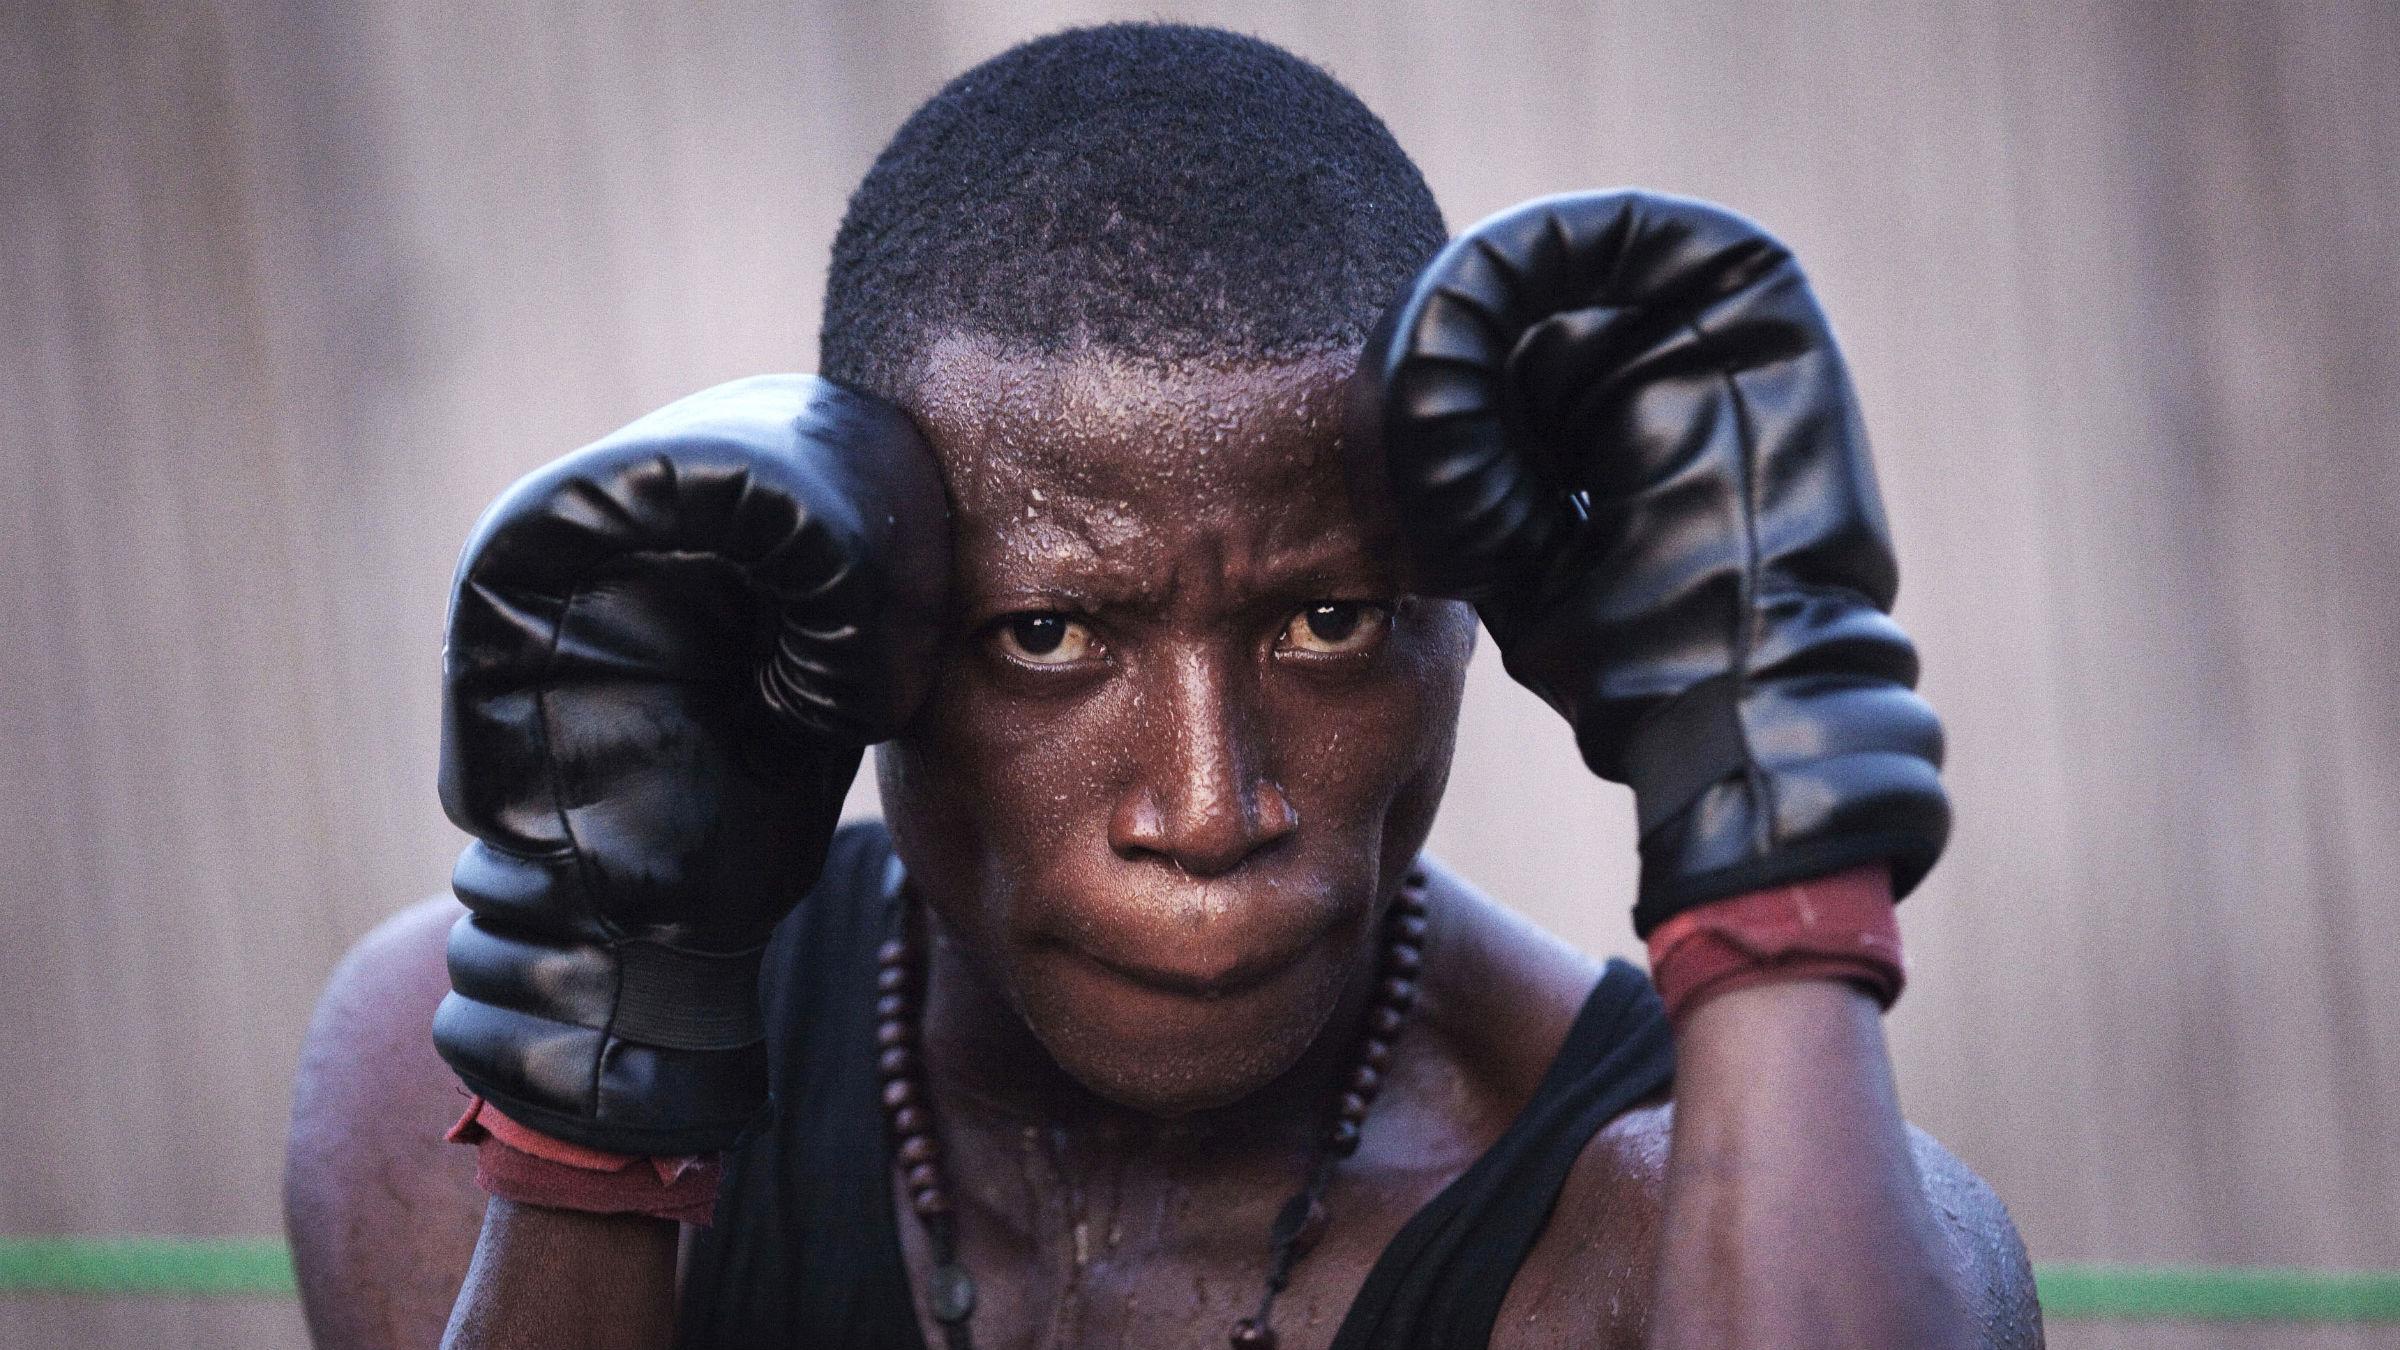 A professional boxer